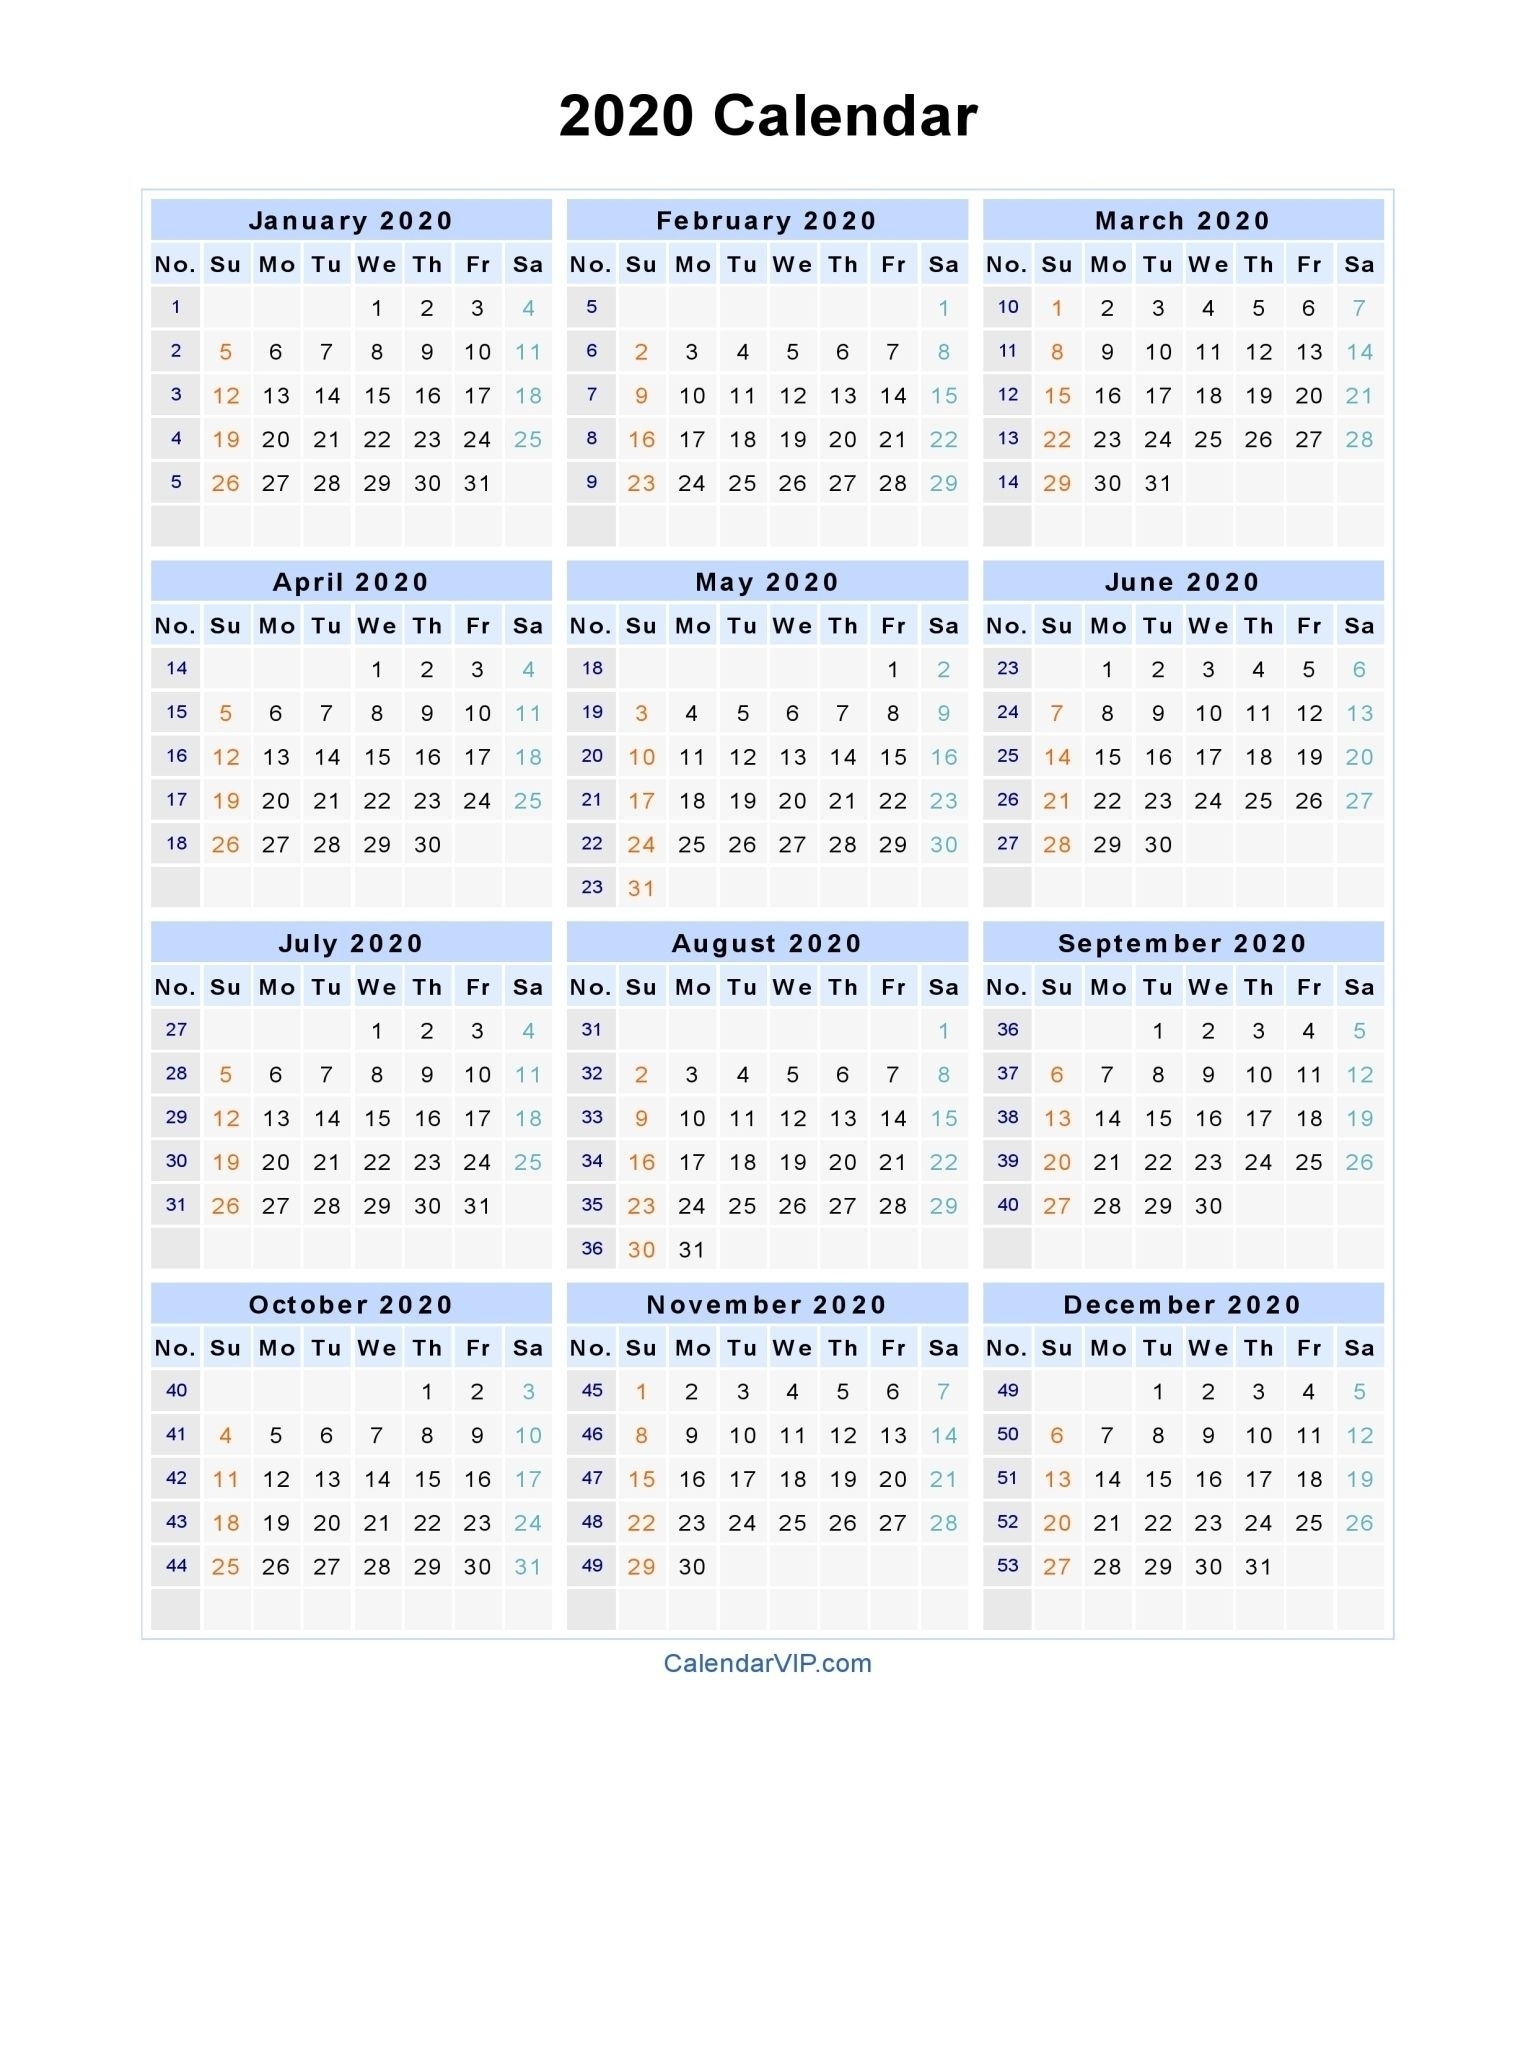 2020 Calendar With Week Numbers Excel - Cerno.mioduchowski